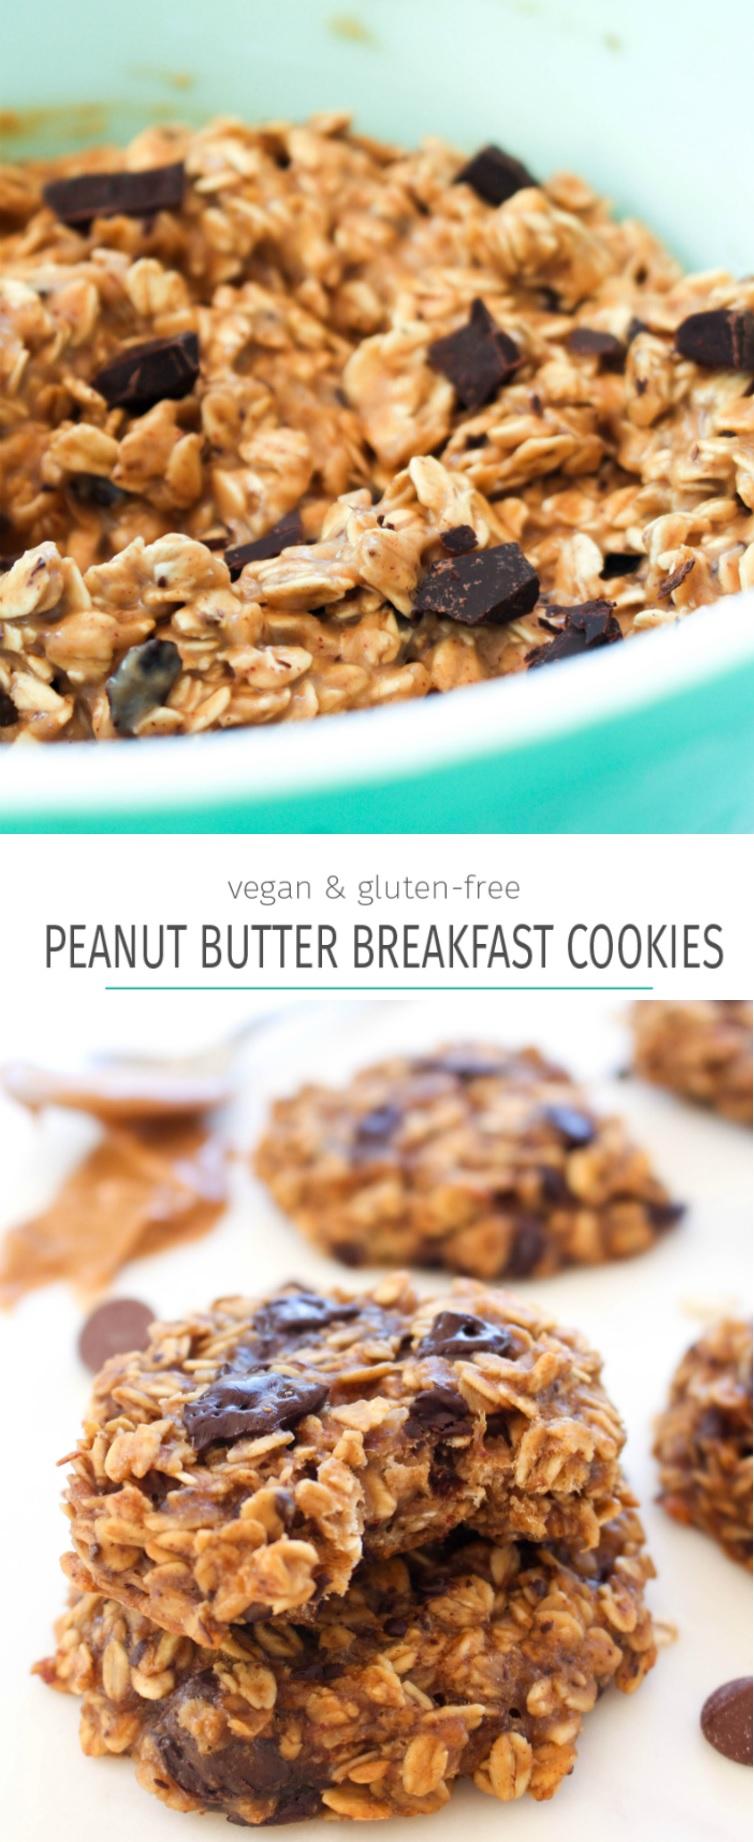 Peanut butter banana breakfast cookies collage